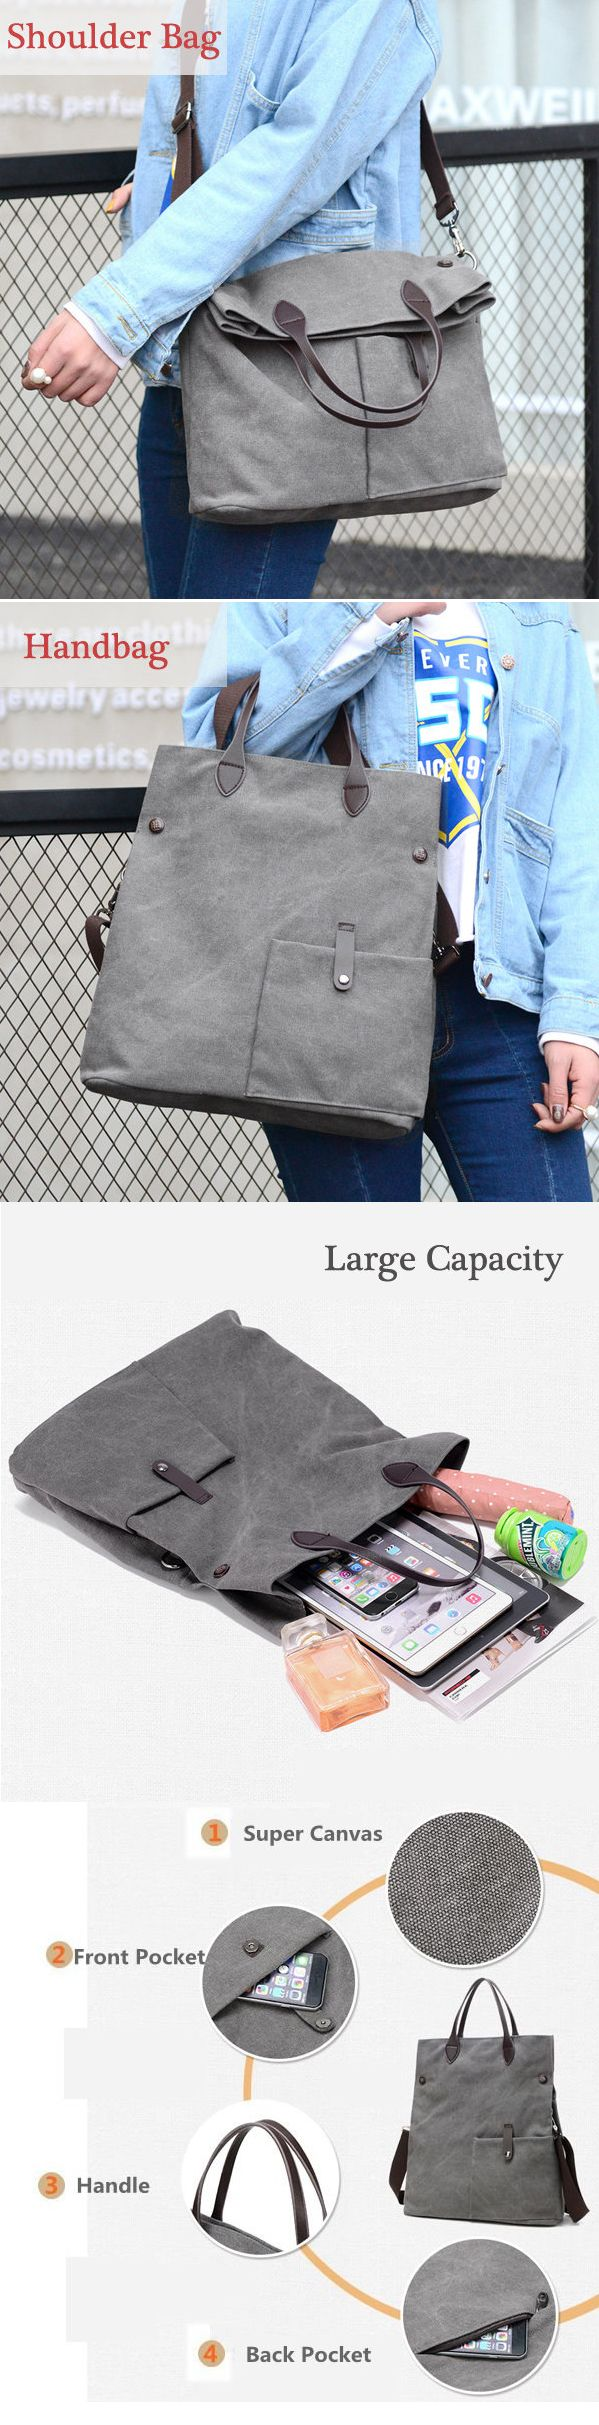 Women Canvas Dual-use Handbag Rucksack Shoulder Bag Shopping Bag Satchel Bag